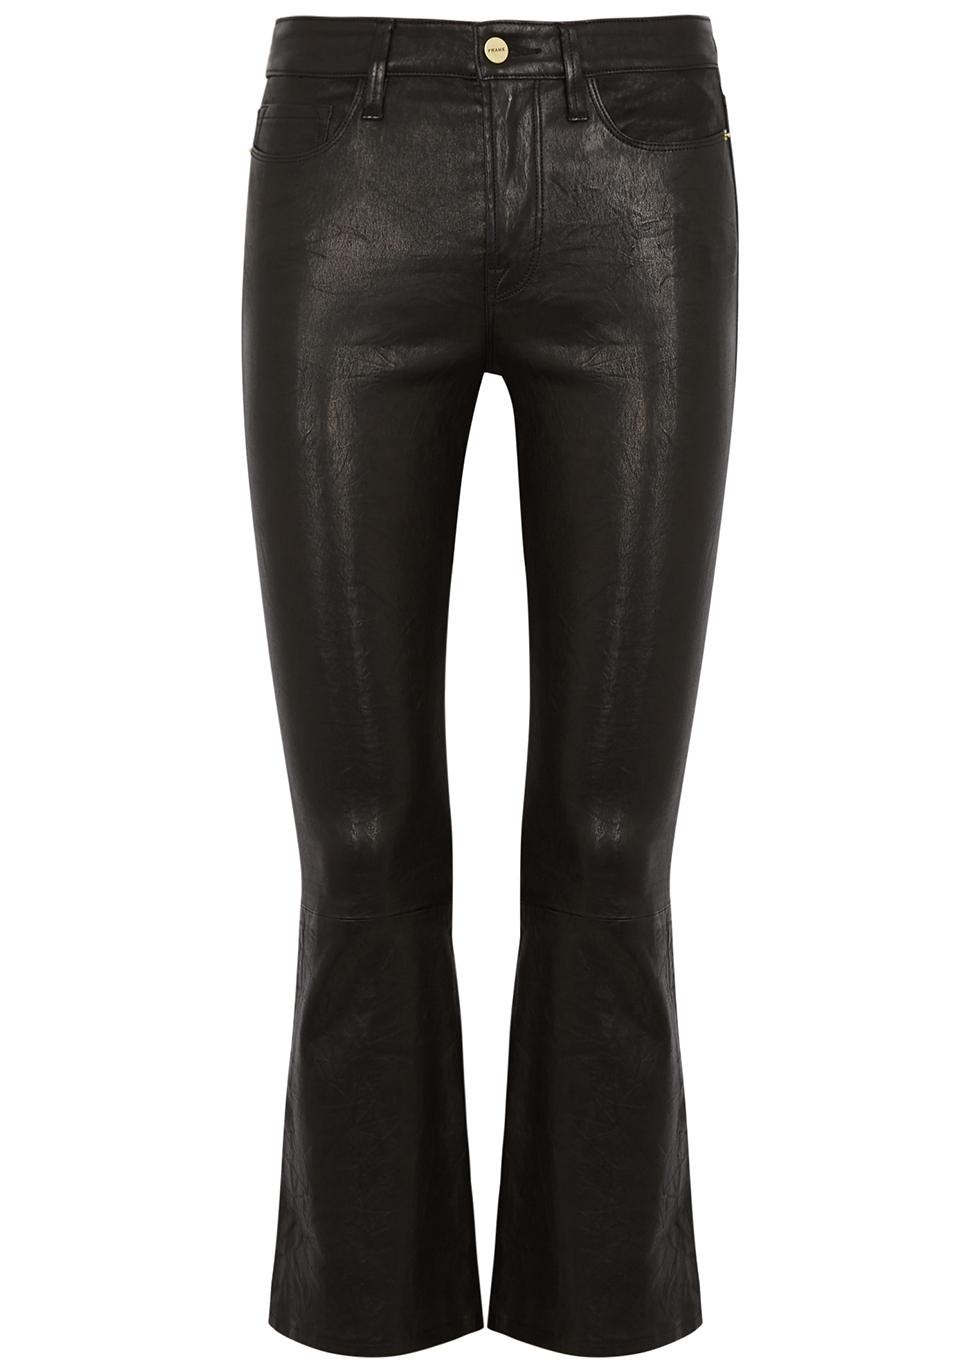 Le Crop Mini Boot black leather jeans